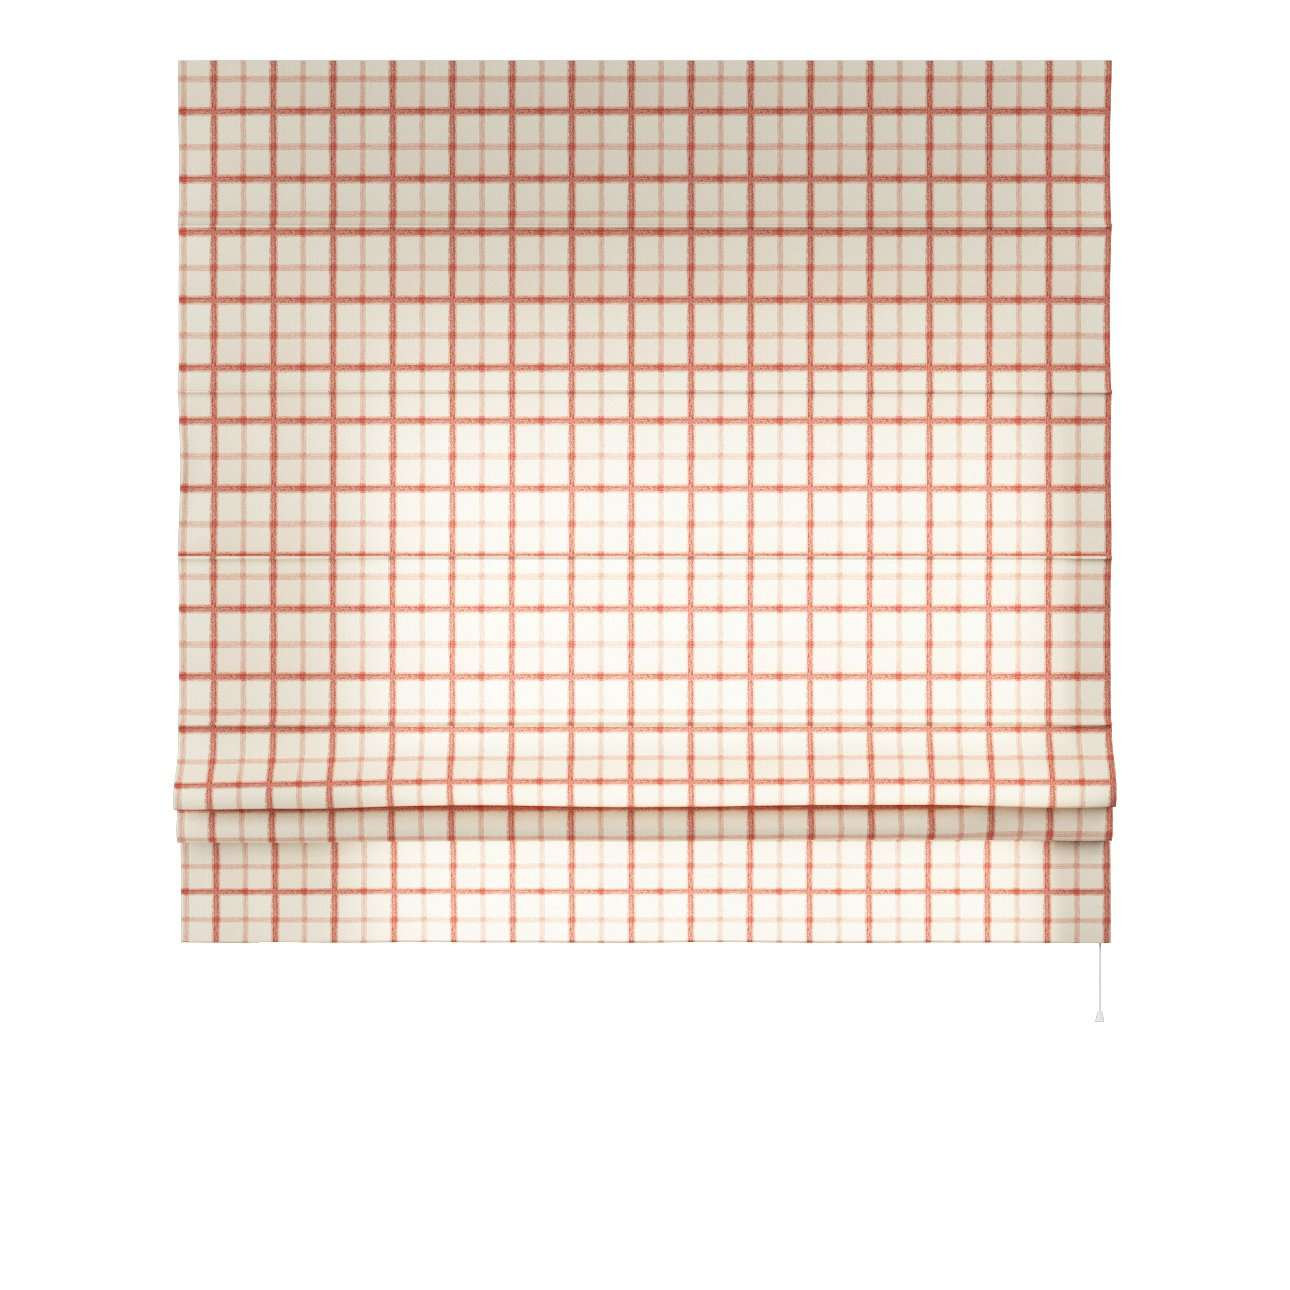 Roleta rzymska Padva w kolekcji Avinon, tkanina: 131-15